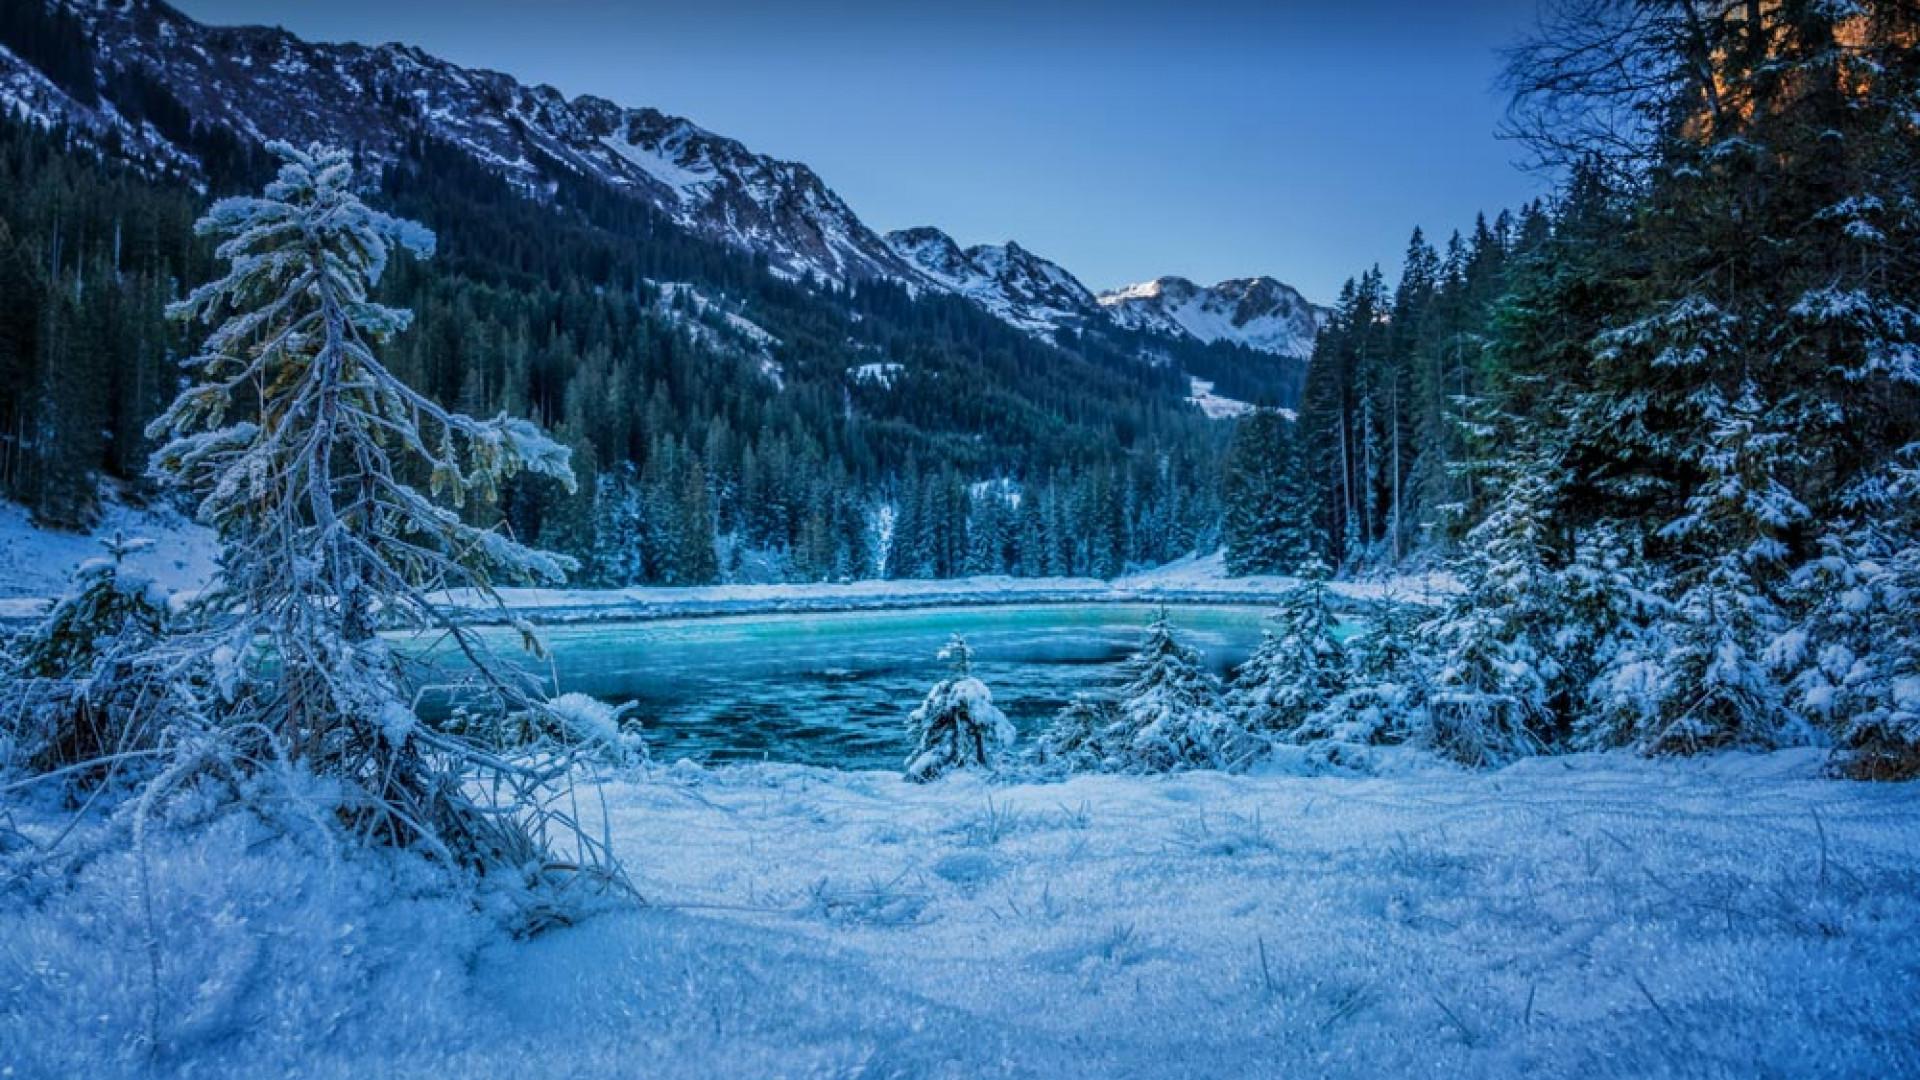 Lakeside alpine views at Alphotel, Austria